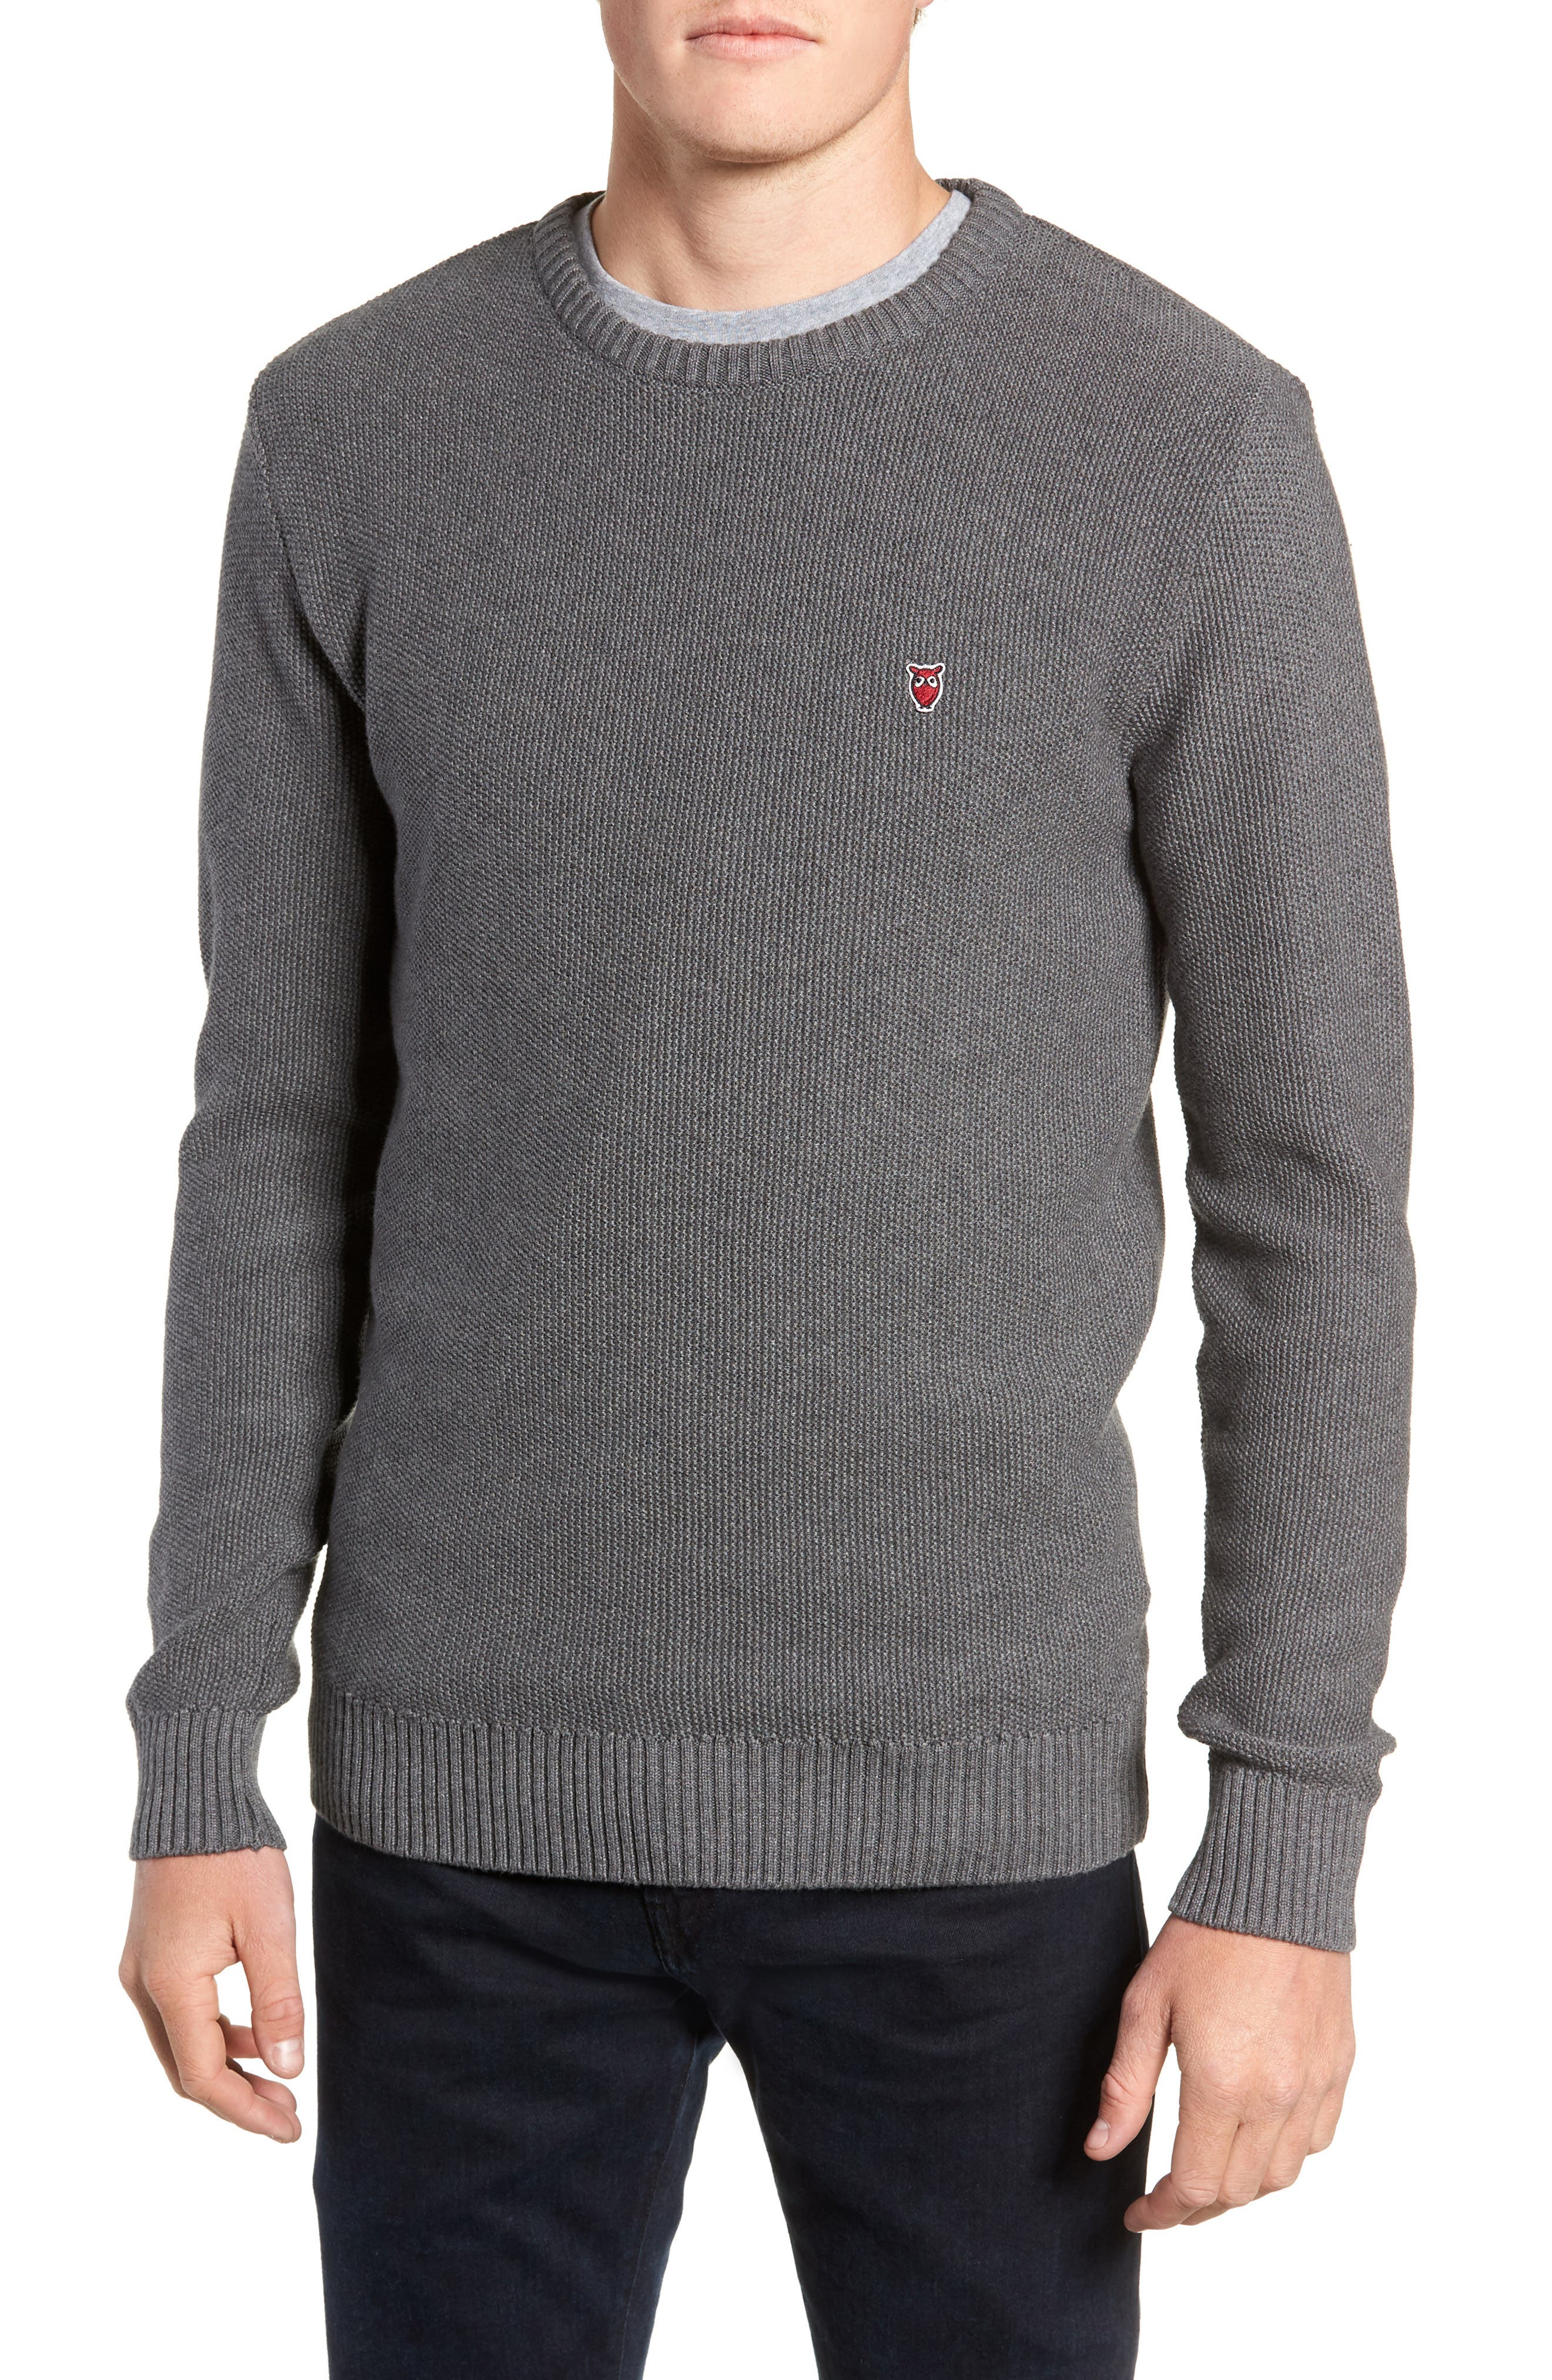 Owl Textured Sweater,                         Main,                         color, GREY MELANGE